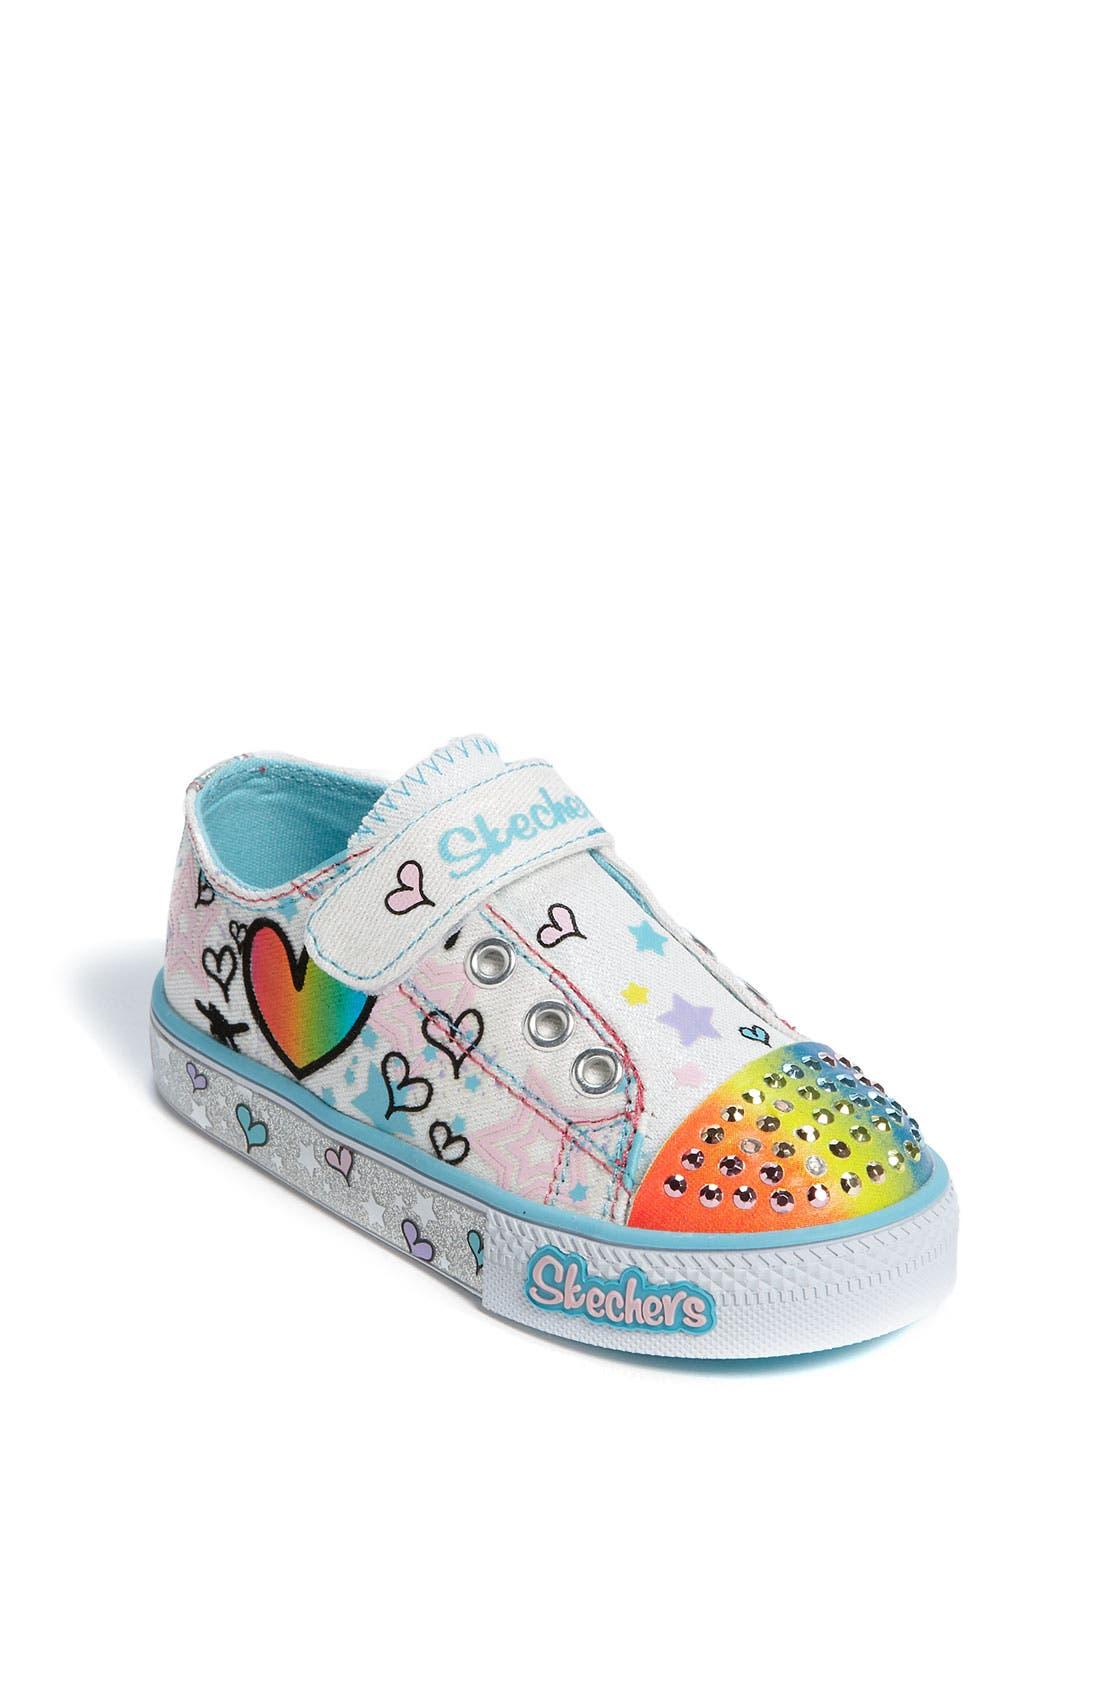 Main Image - SKECHERS 'Peekaboo' Sneaker (Walker & Toddler)